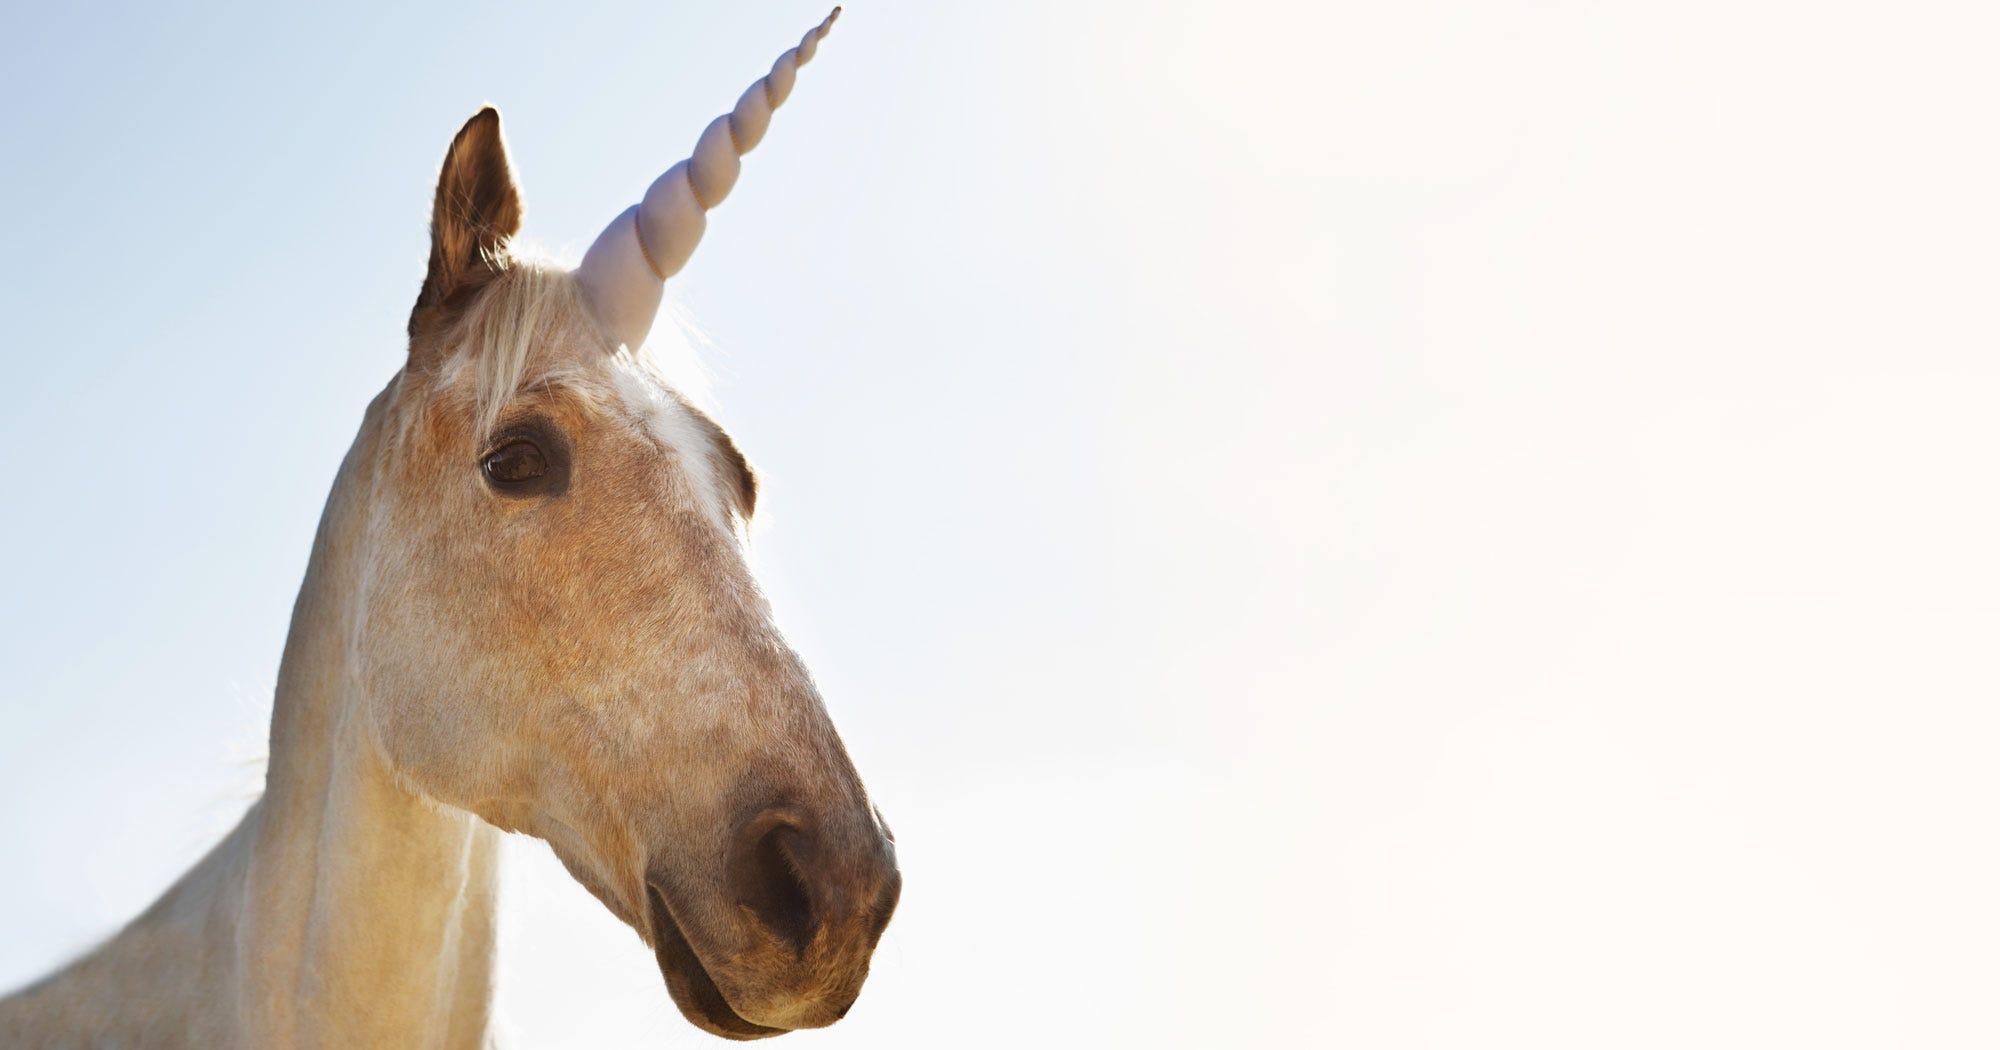 Siberian Unicorn Fossil 29000 Years Ago